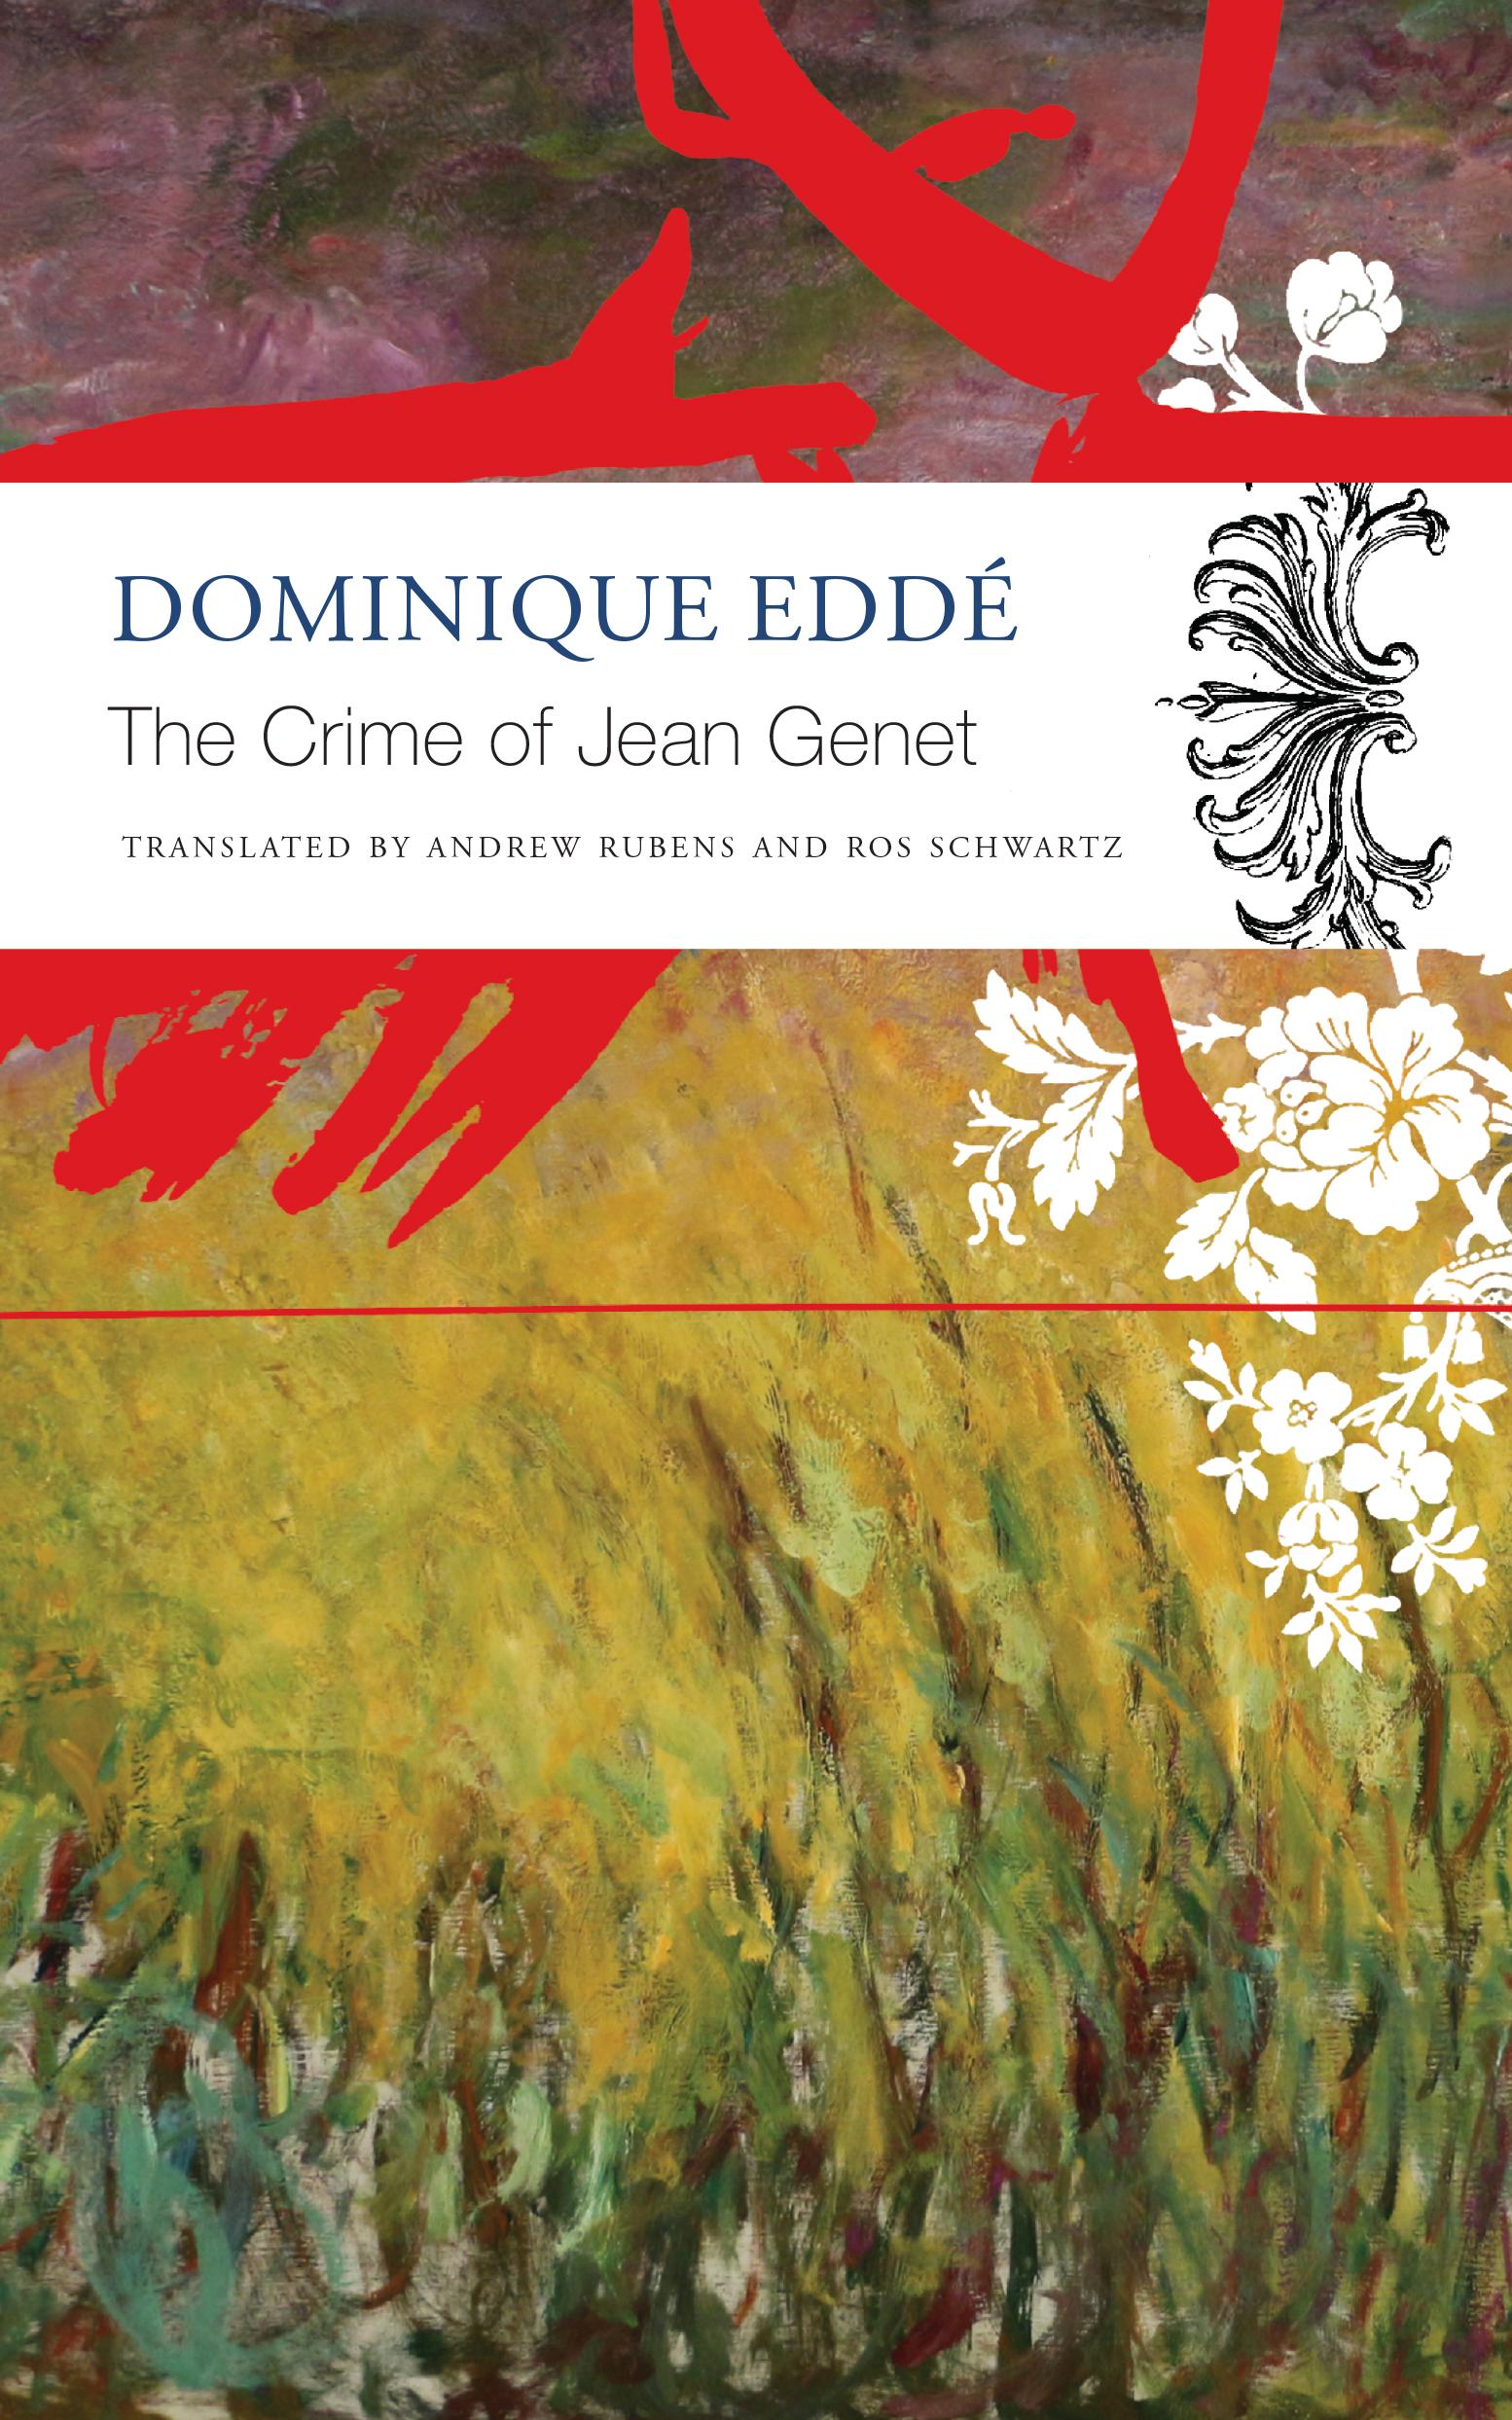 The Crime of Jean Genet by Dominique Eddé    Seagull Books